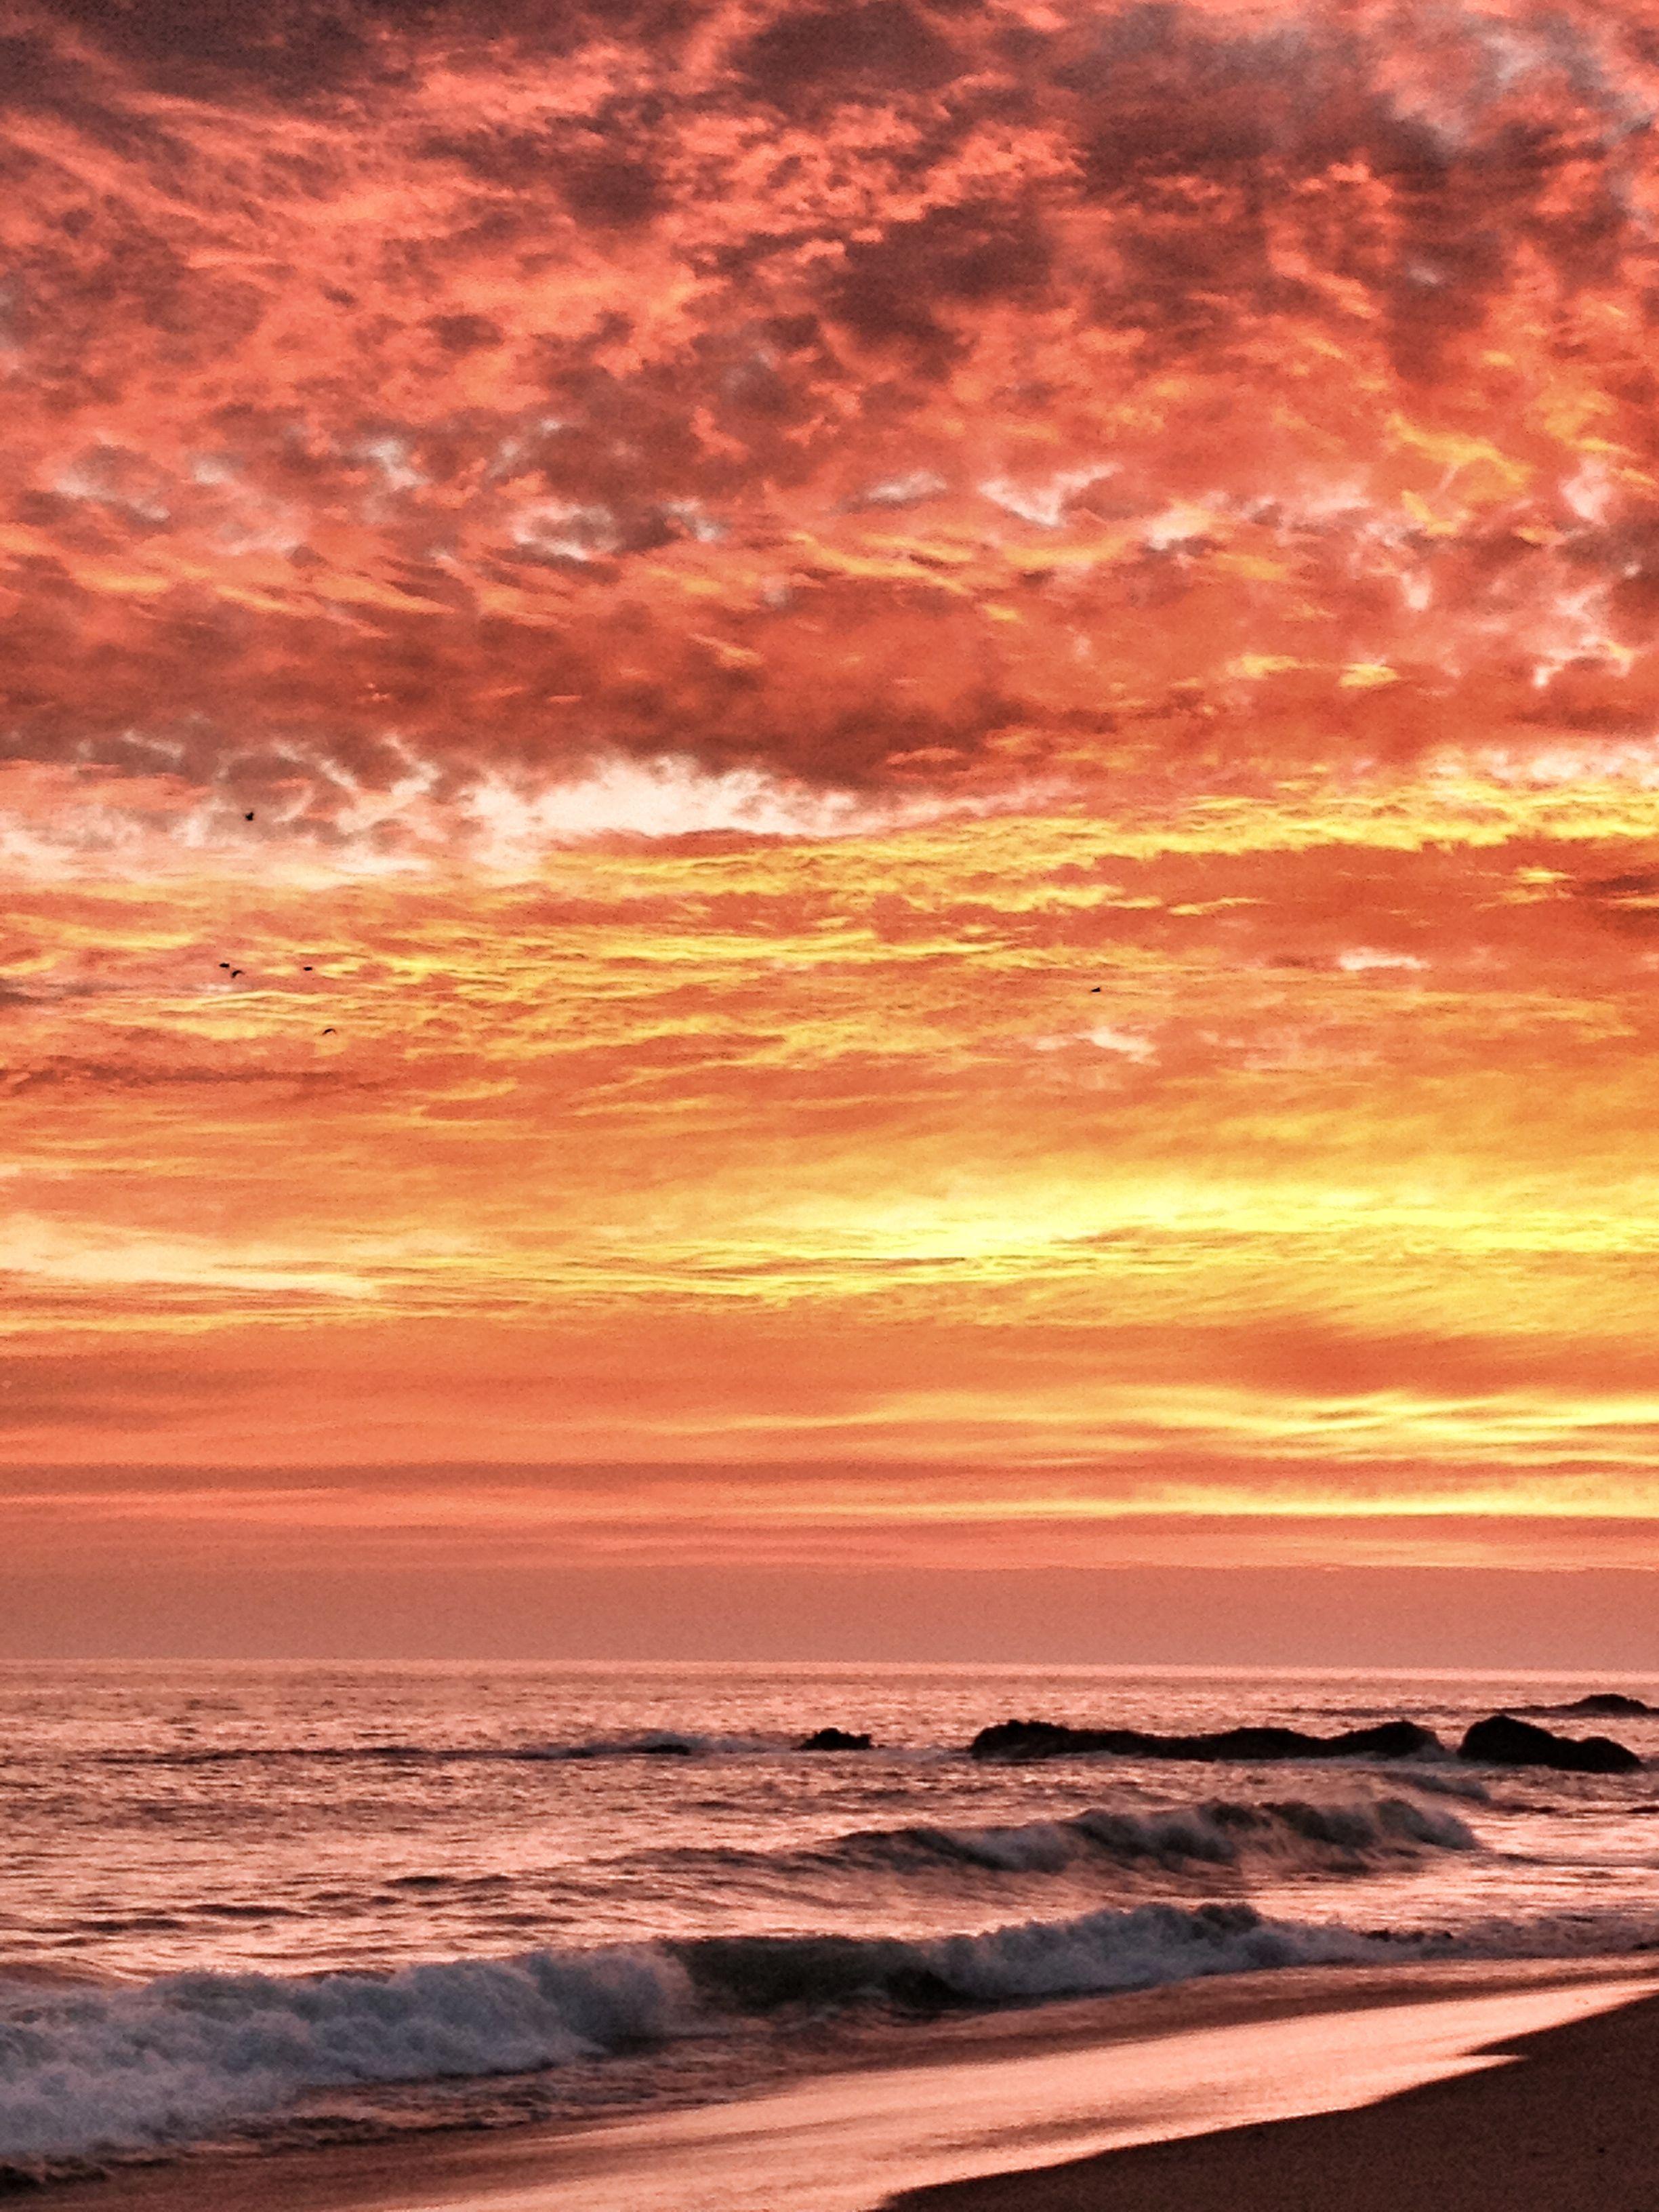 Laguna Beach sunset. Aug 2 2013.